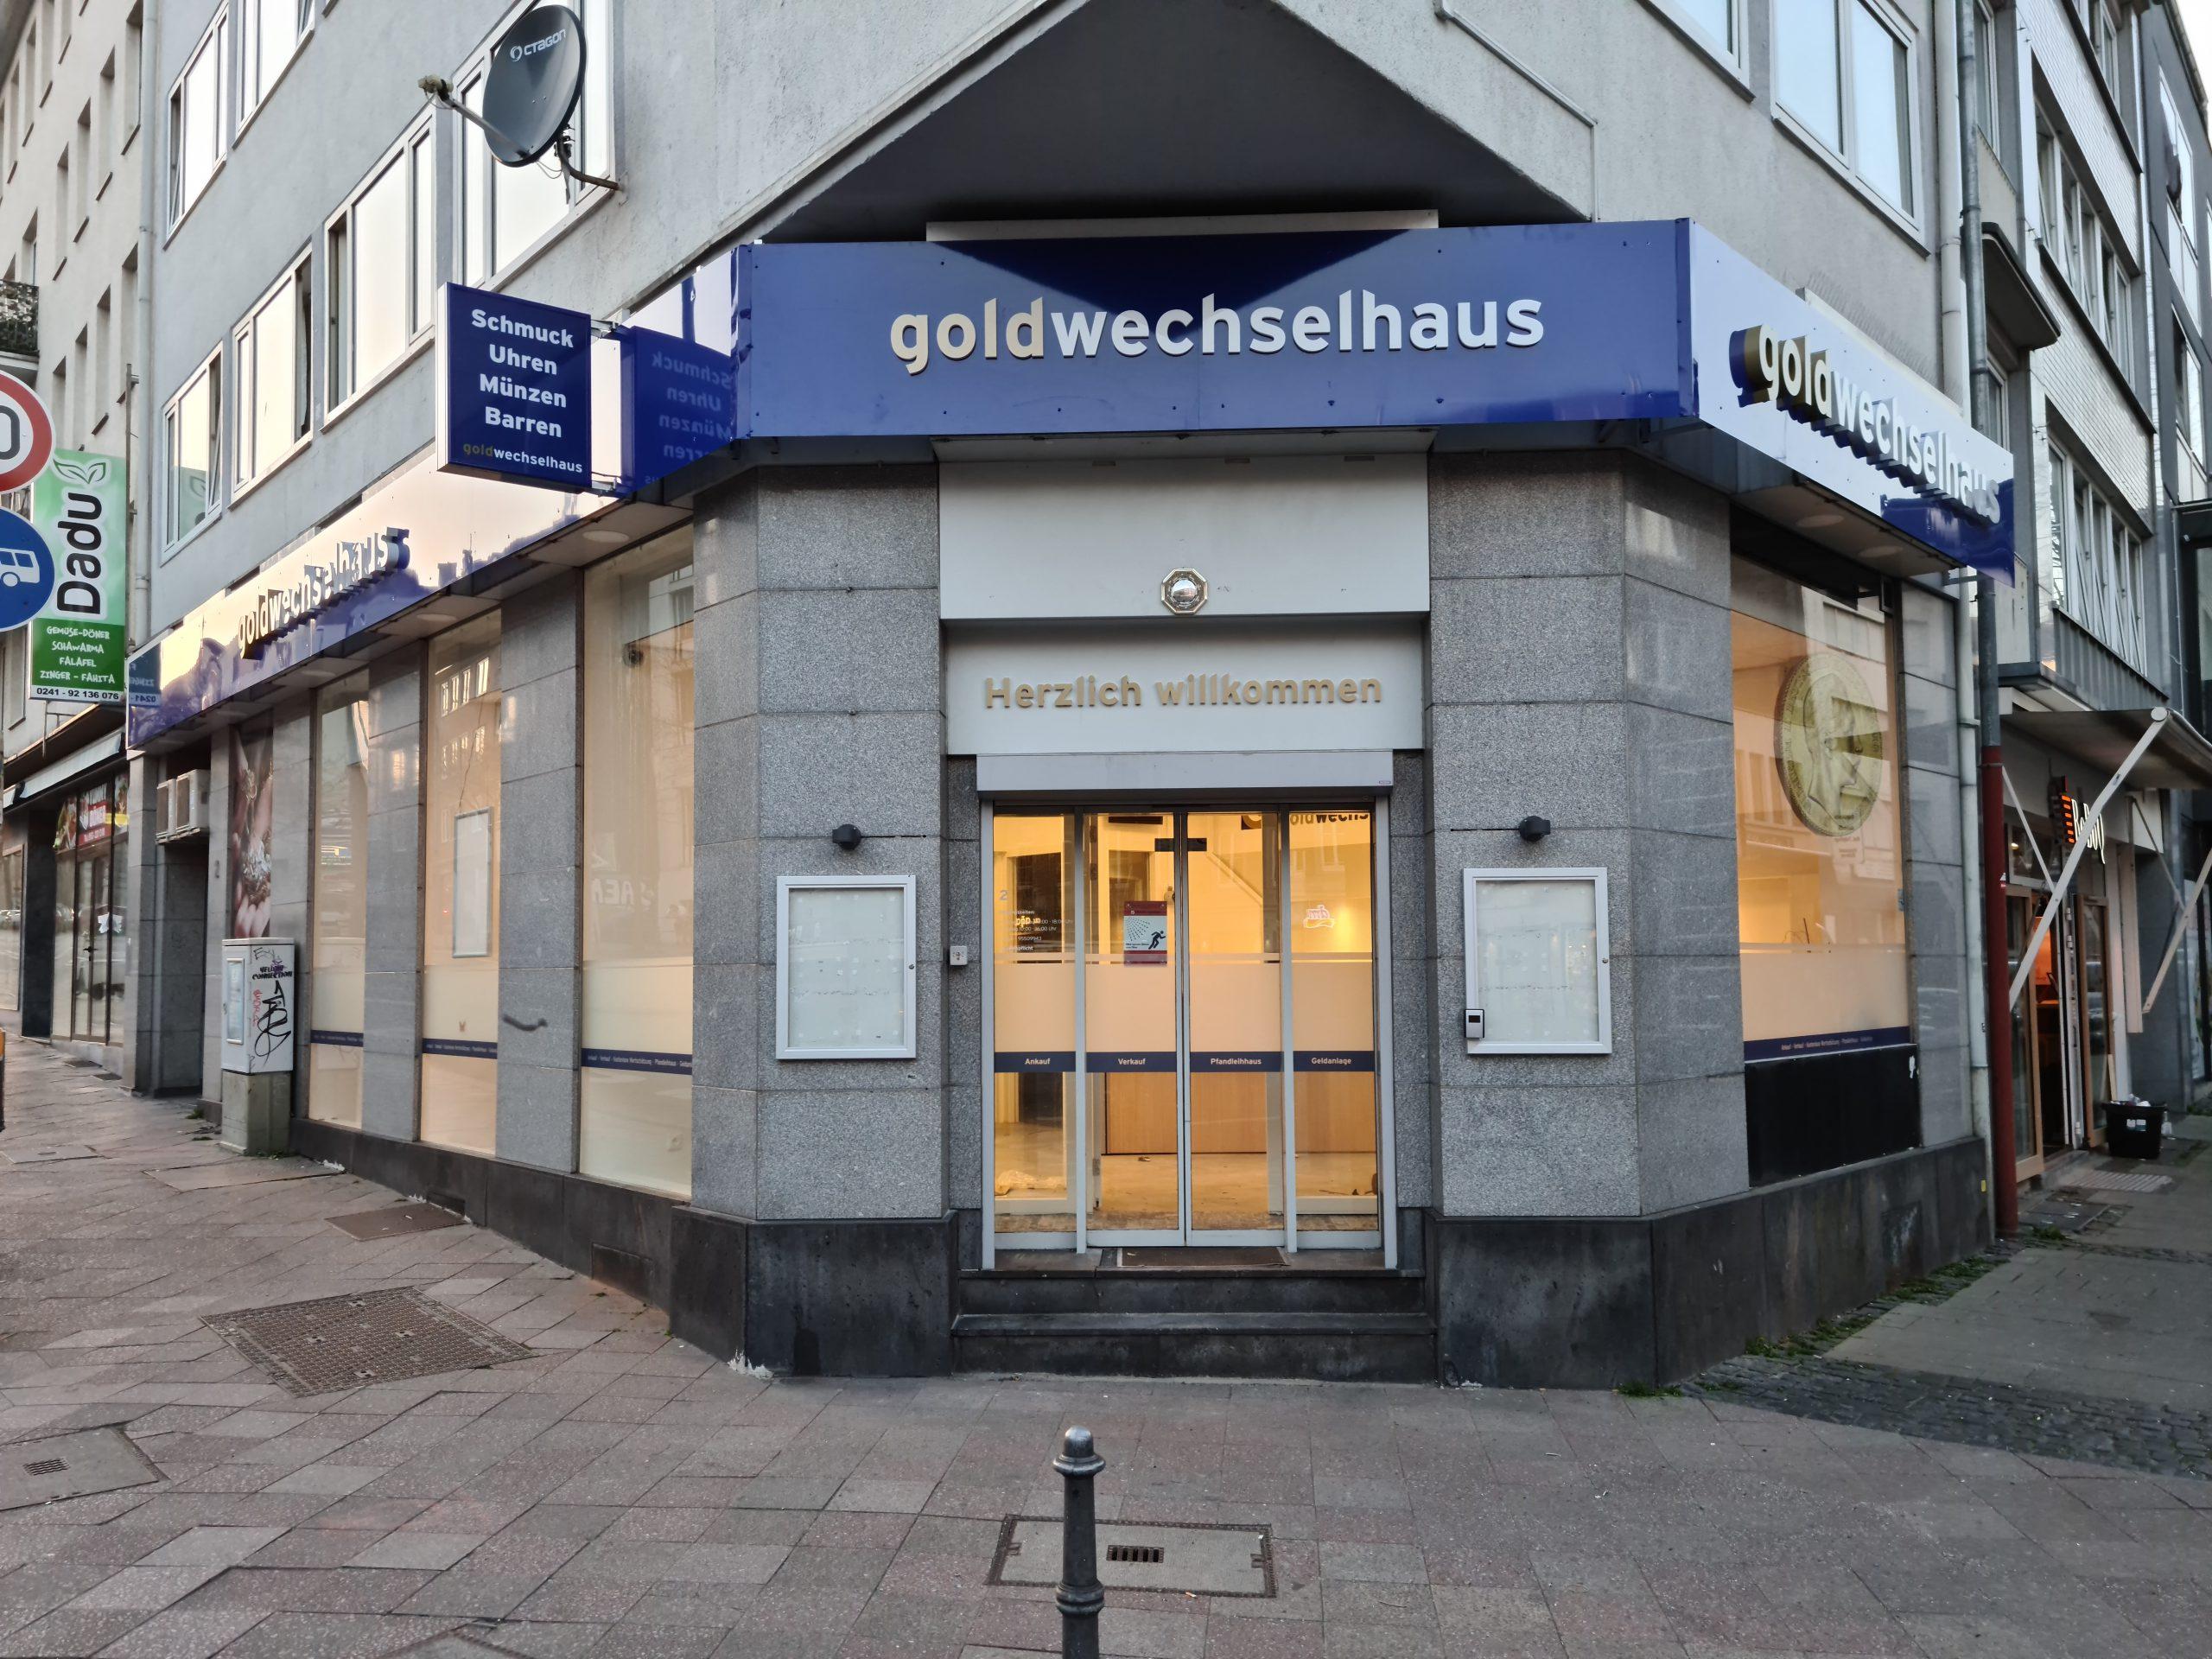 Goldwechselhaus erobert den deutschen Markt